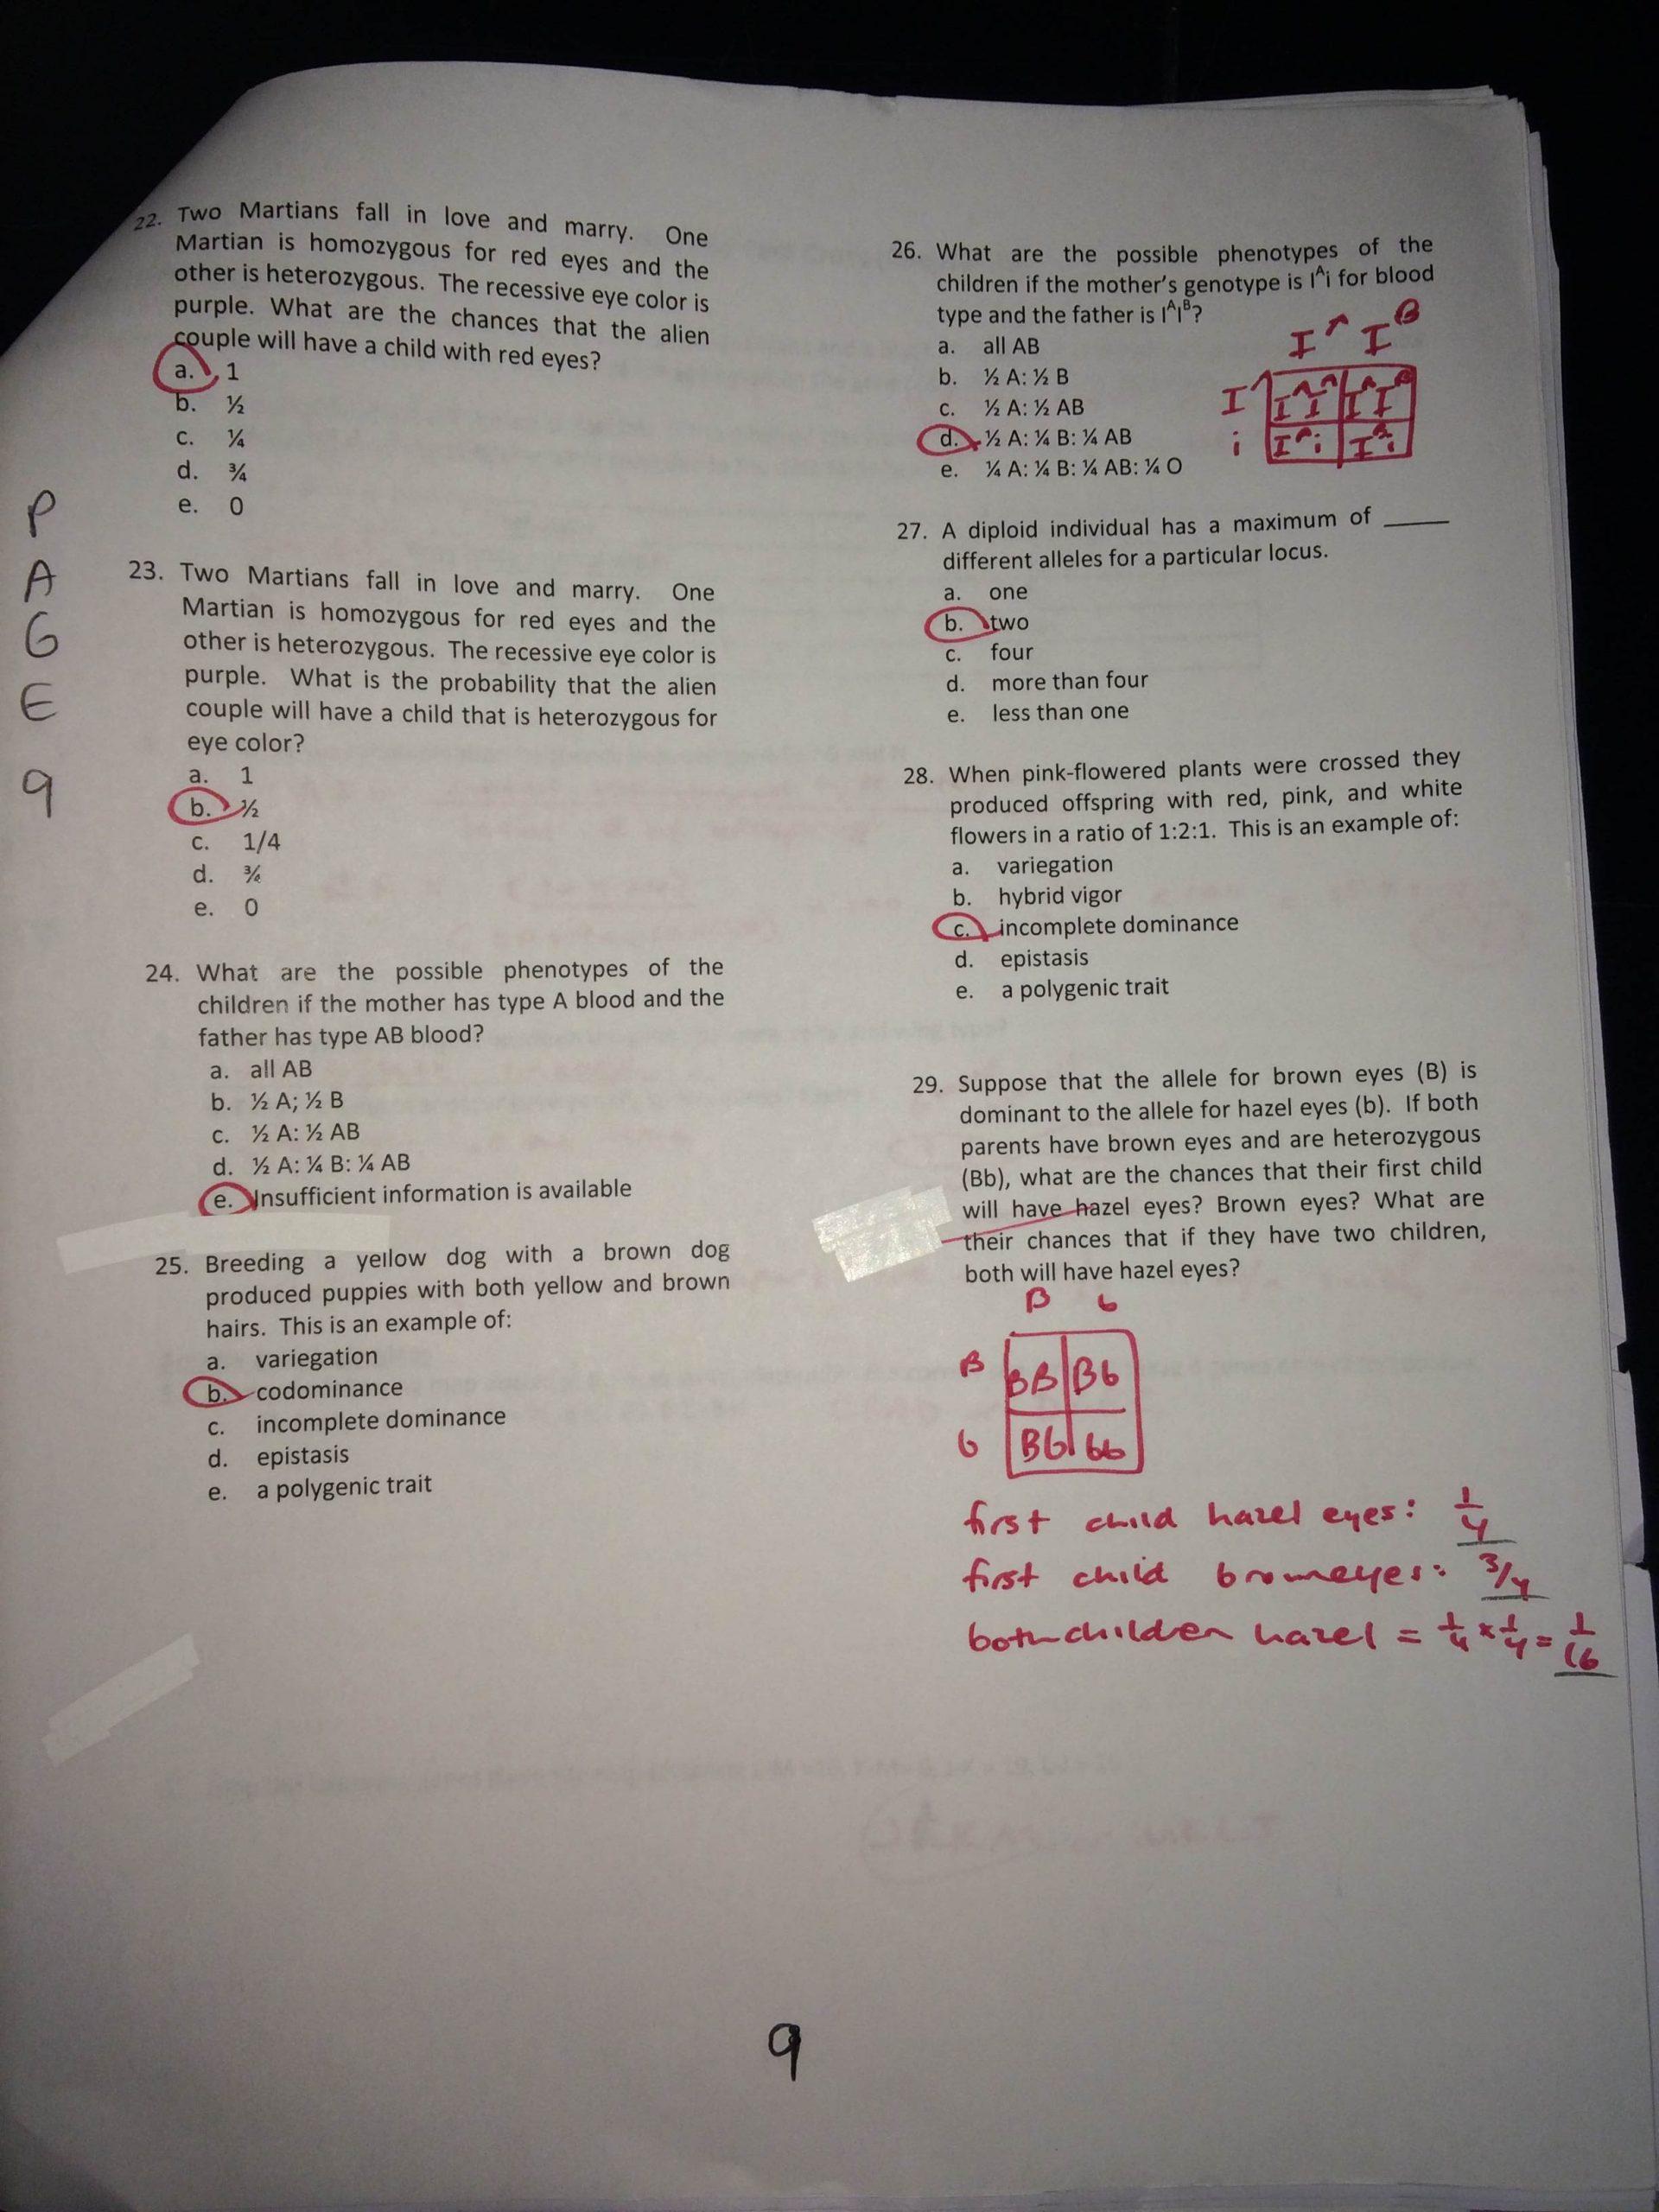 Genetics Practice Problems Worksheet Answers Key Genetics Practice Problems Packet P 6 16 Mrs